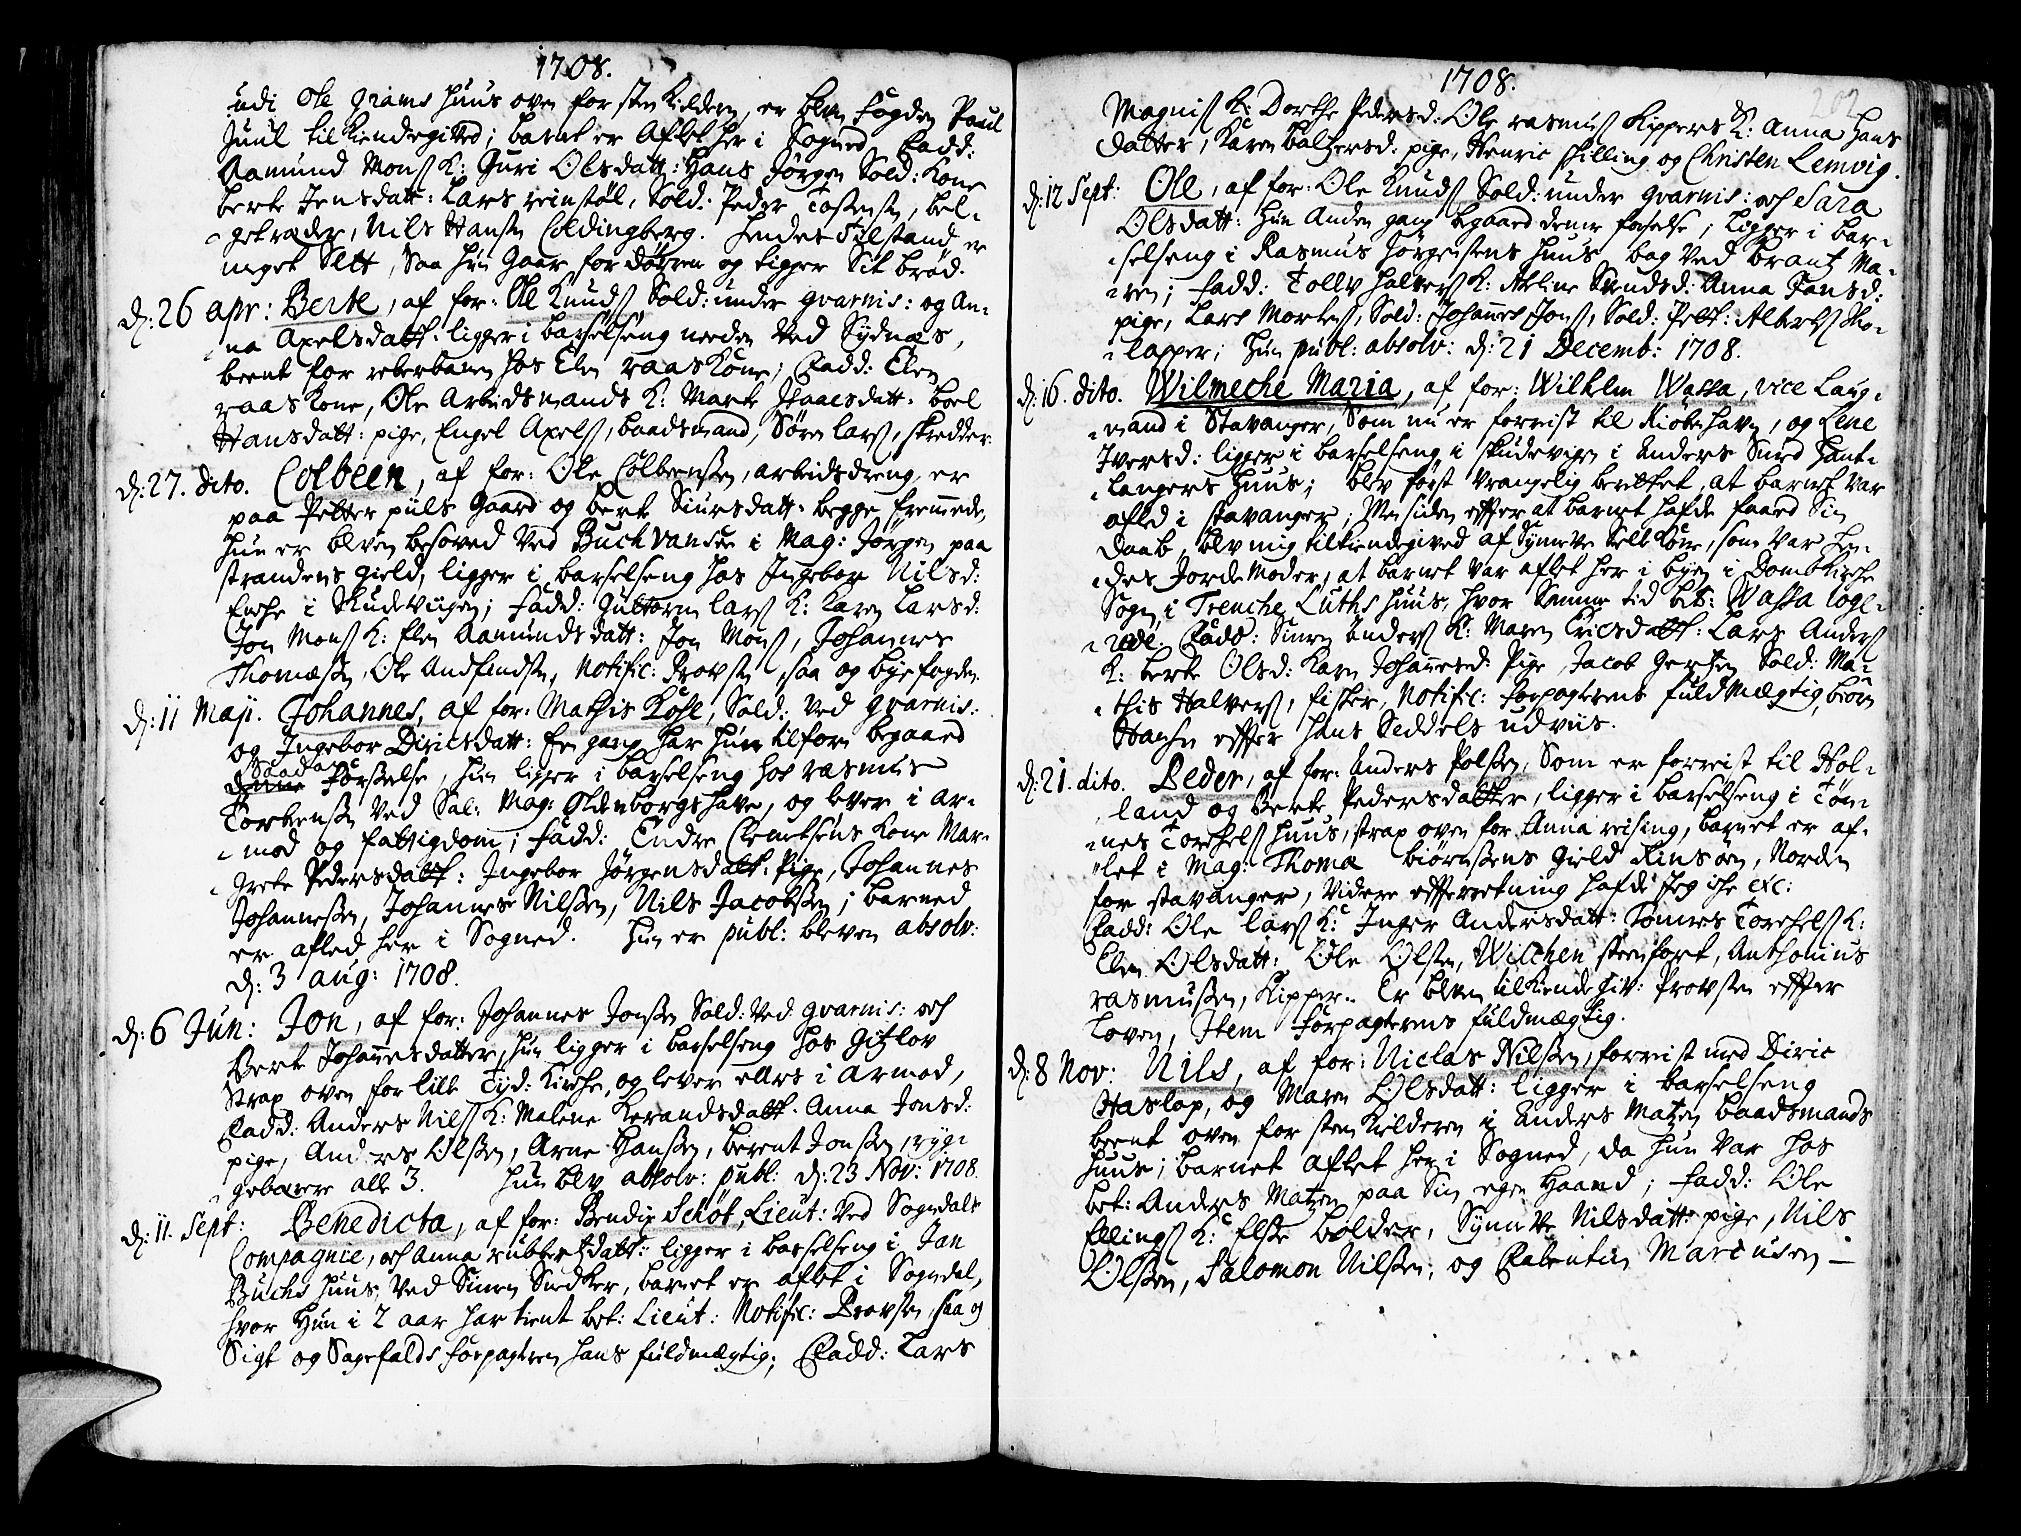 SAB, Korskirken Sokneprestembete, H/Haa/L0003: Ministerialbok nr. A 3, 1698-1719, s. 202